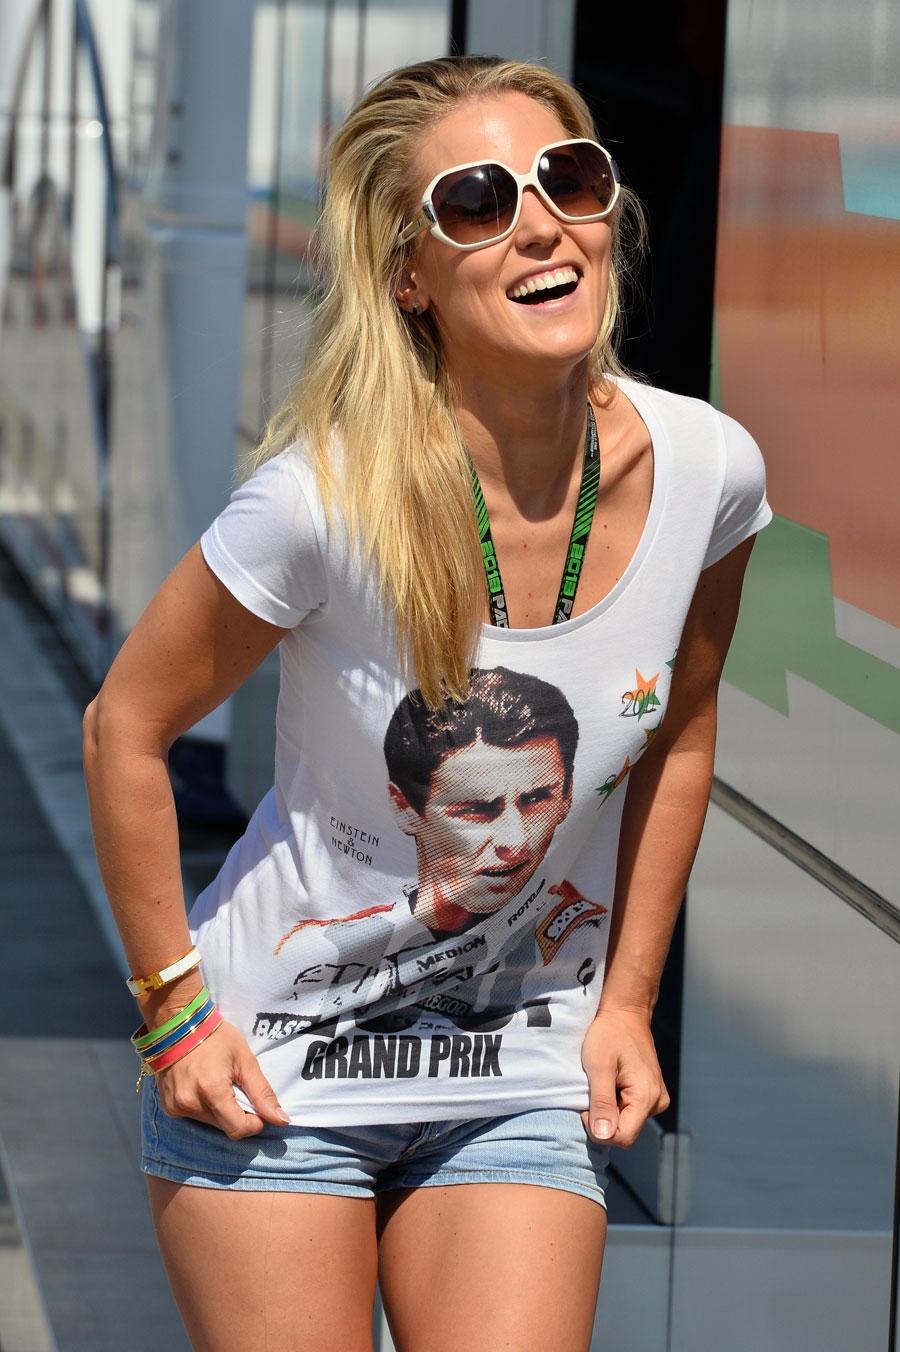 Adrian Sutil's girlfriend, Jennifer Becks, celebrates her boyfriend's 100th race